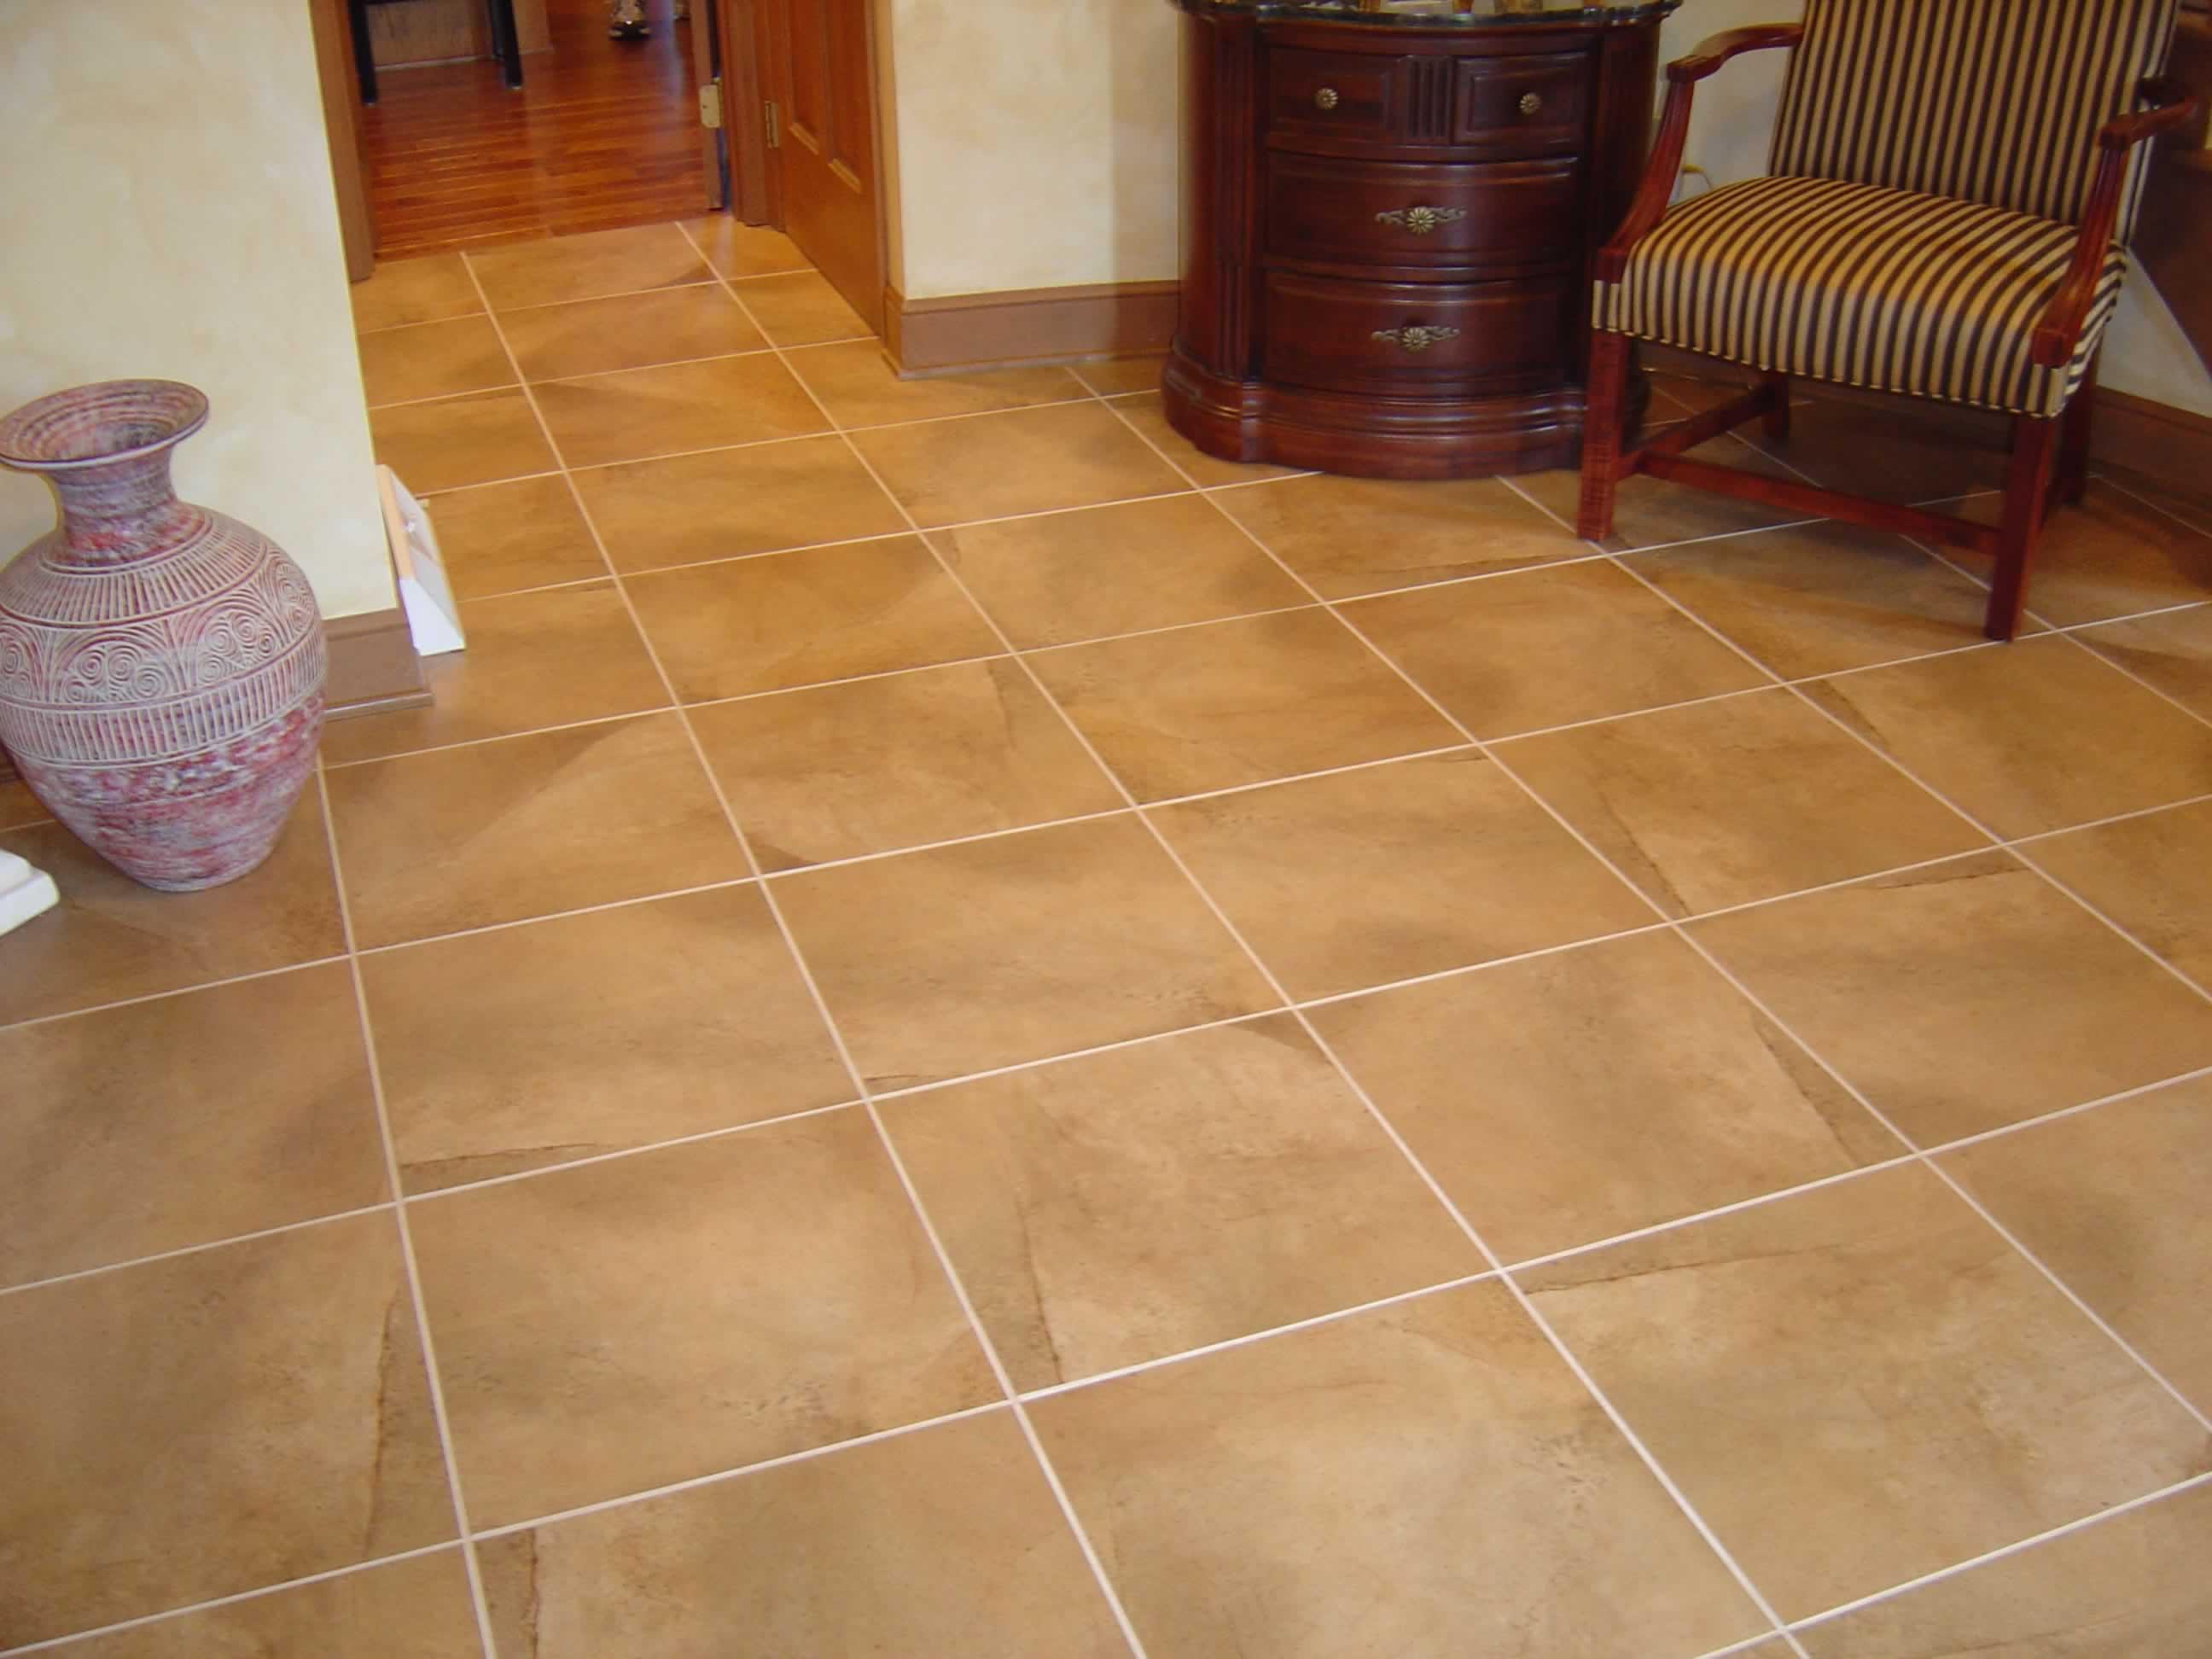 ceramic tile floors 25 tiles together7284a4ccc74e46f8ae3c11e59cddcfff ceramic tile flooring  unique ideas bathroom floor install installation FKAEFBY